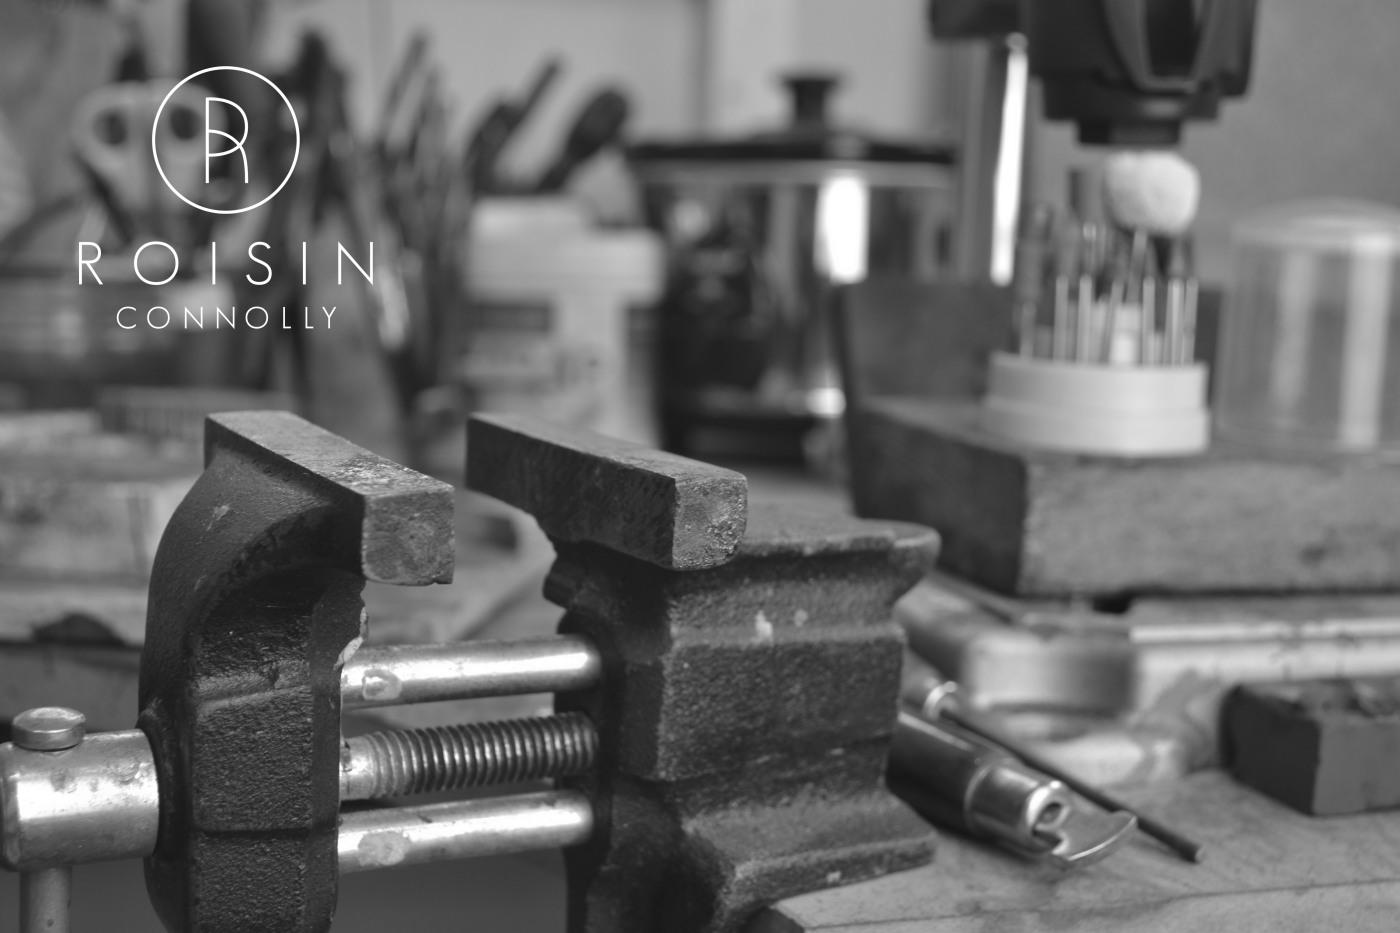 Roisin Workshop